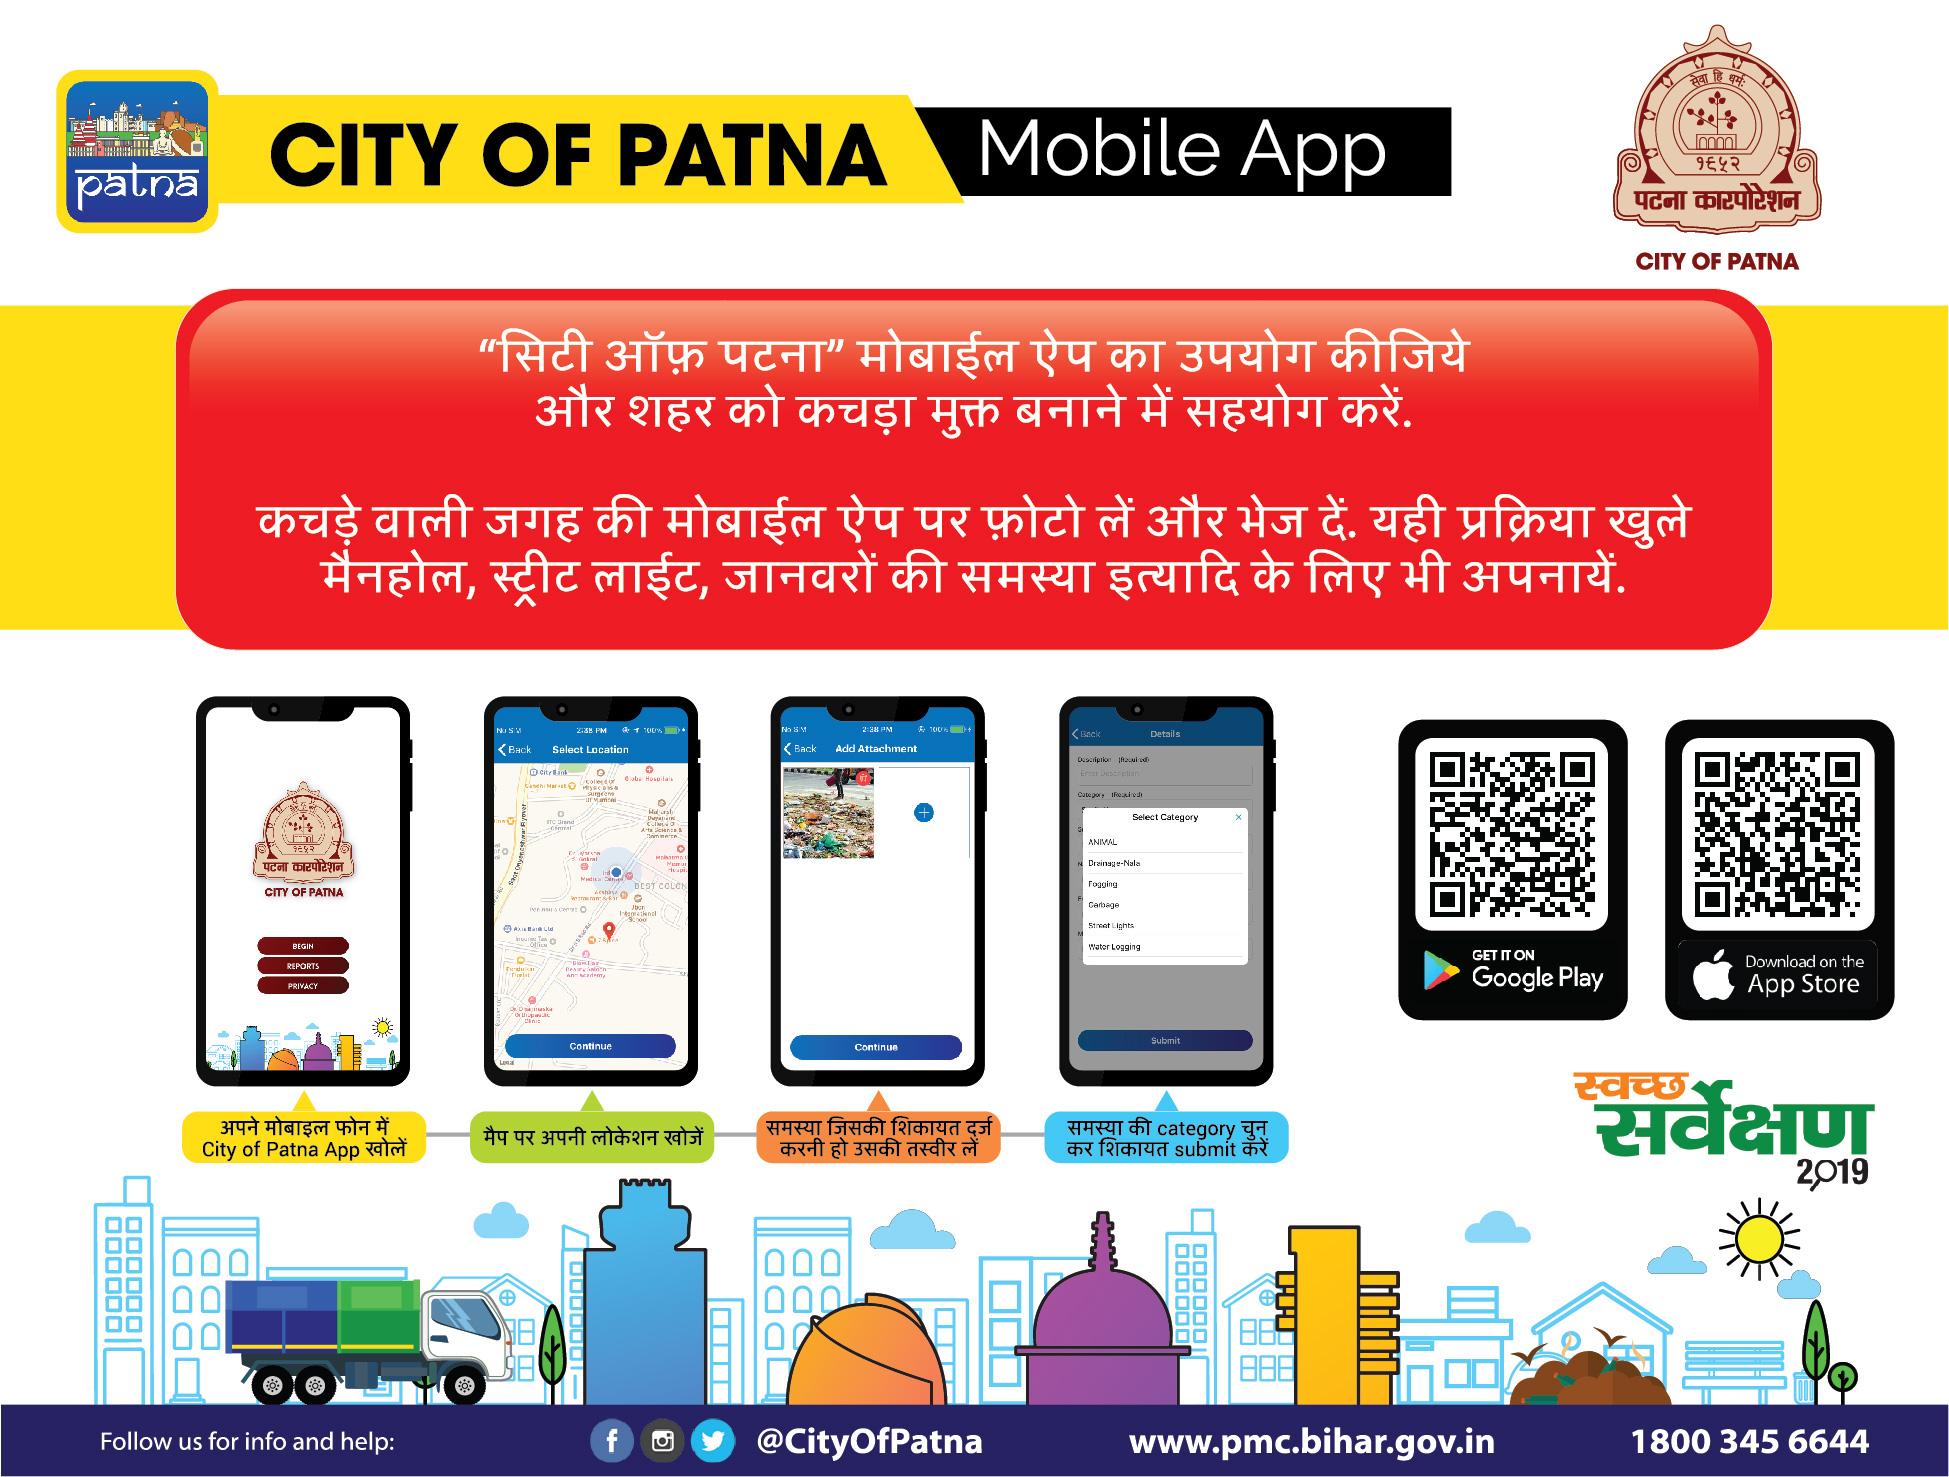 City of Patna App, Patna, Bihar